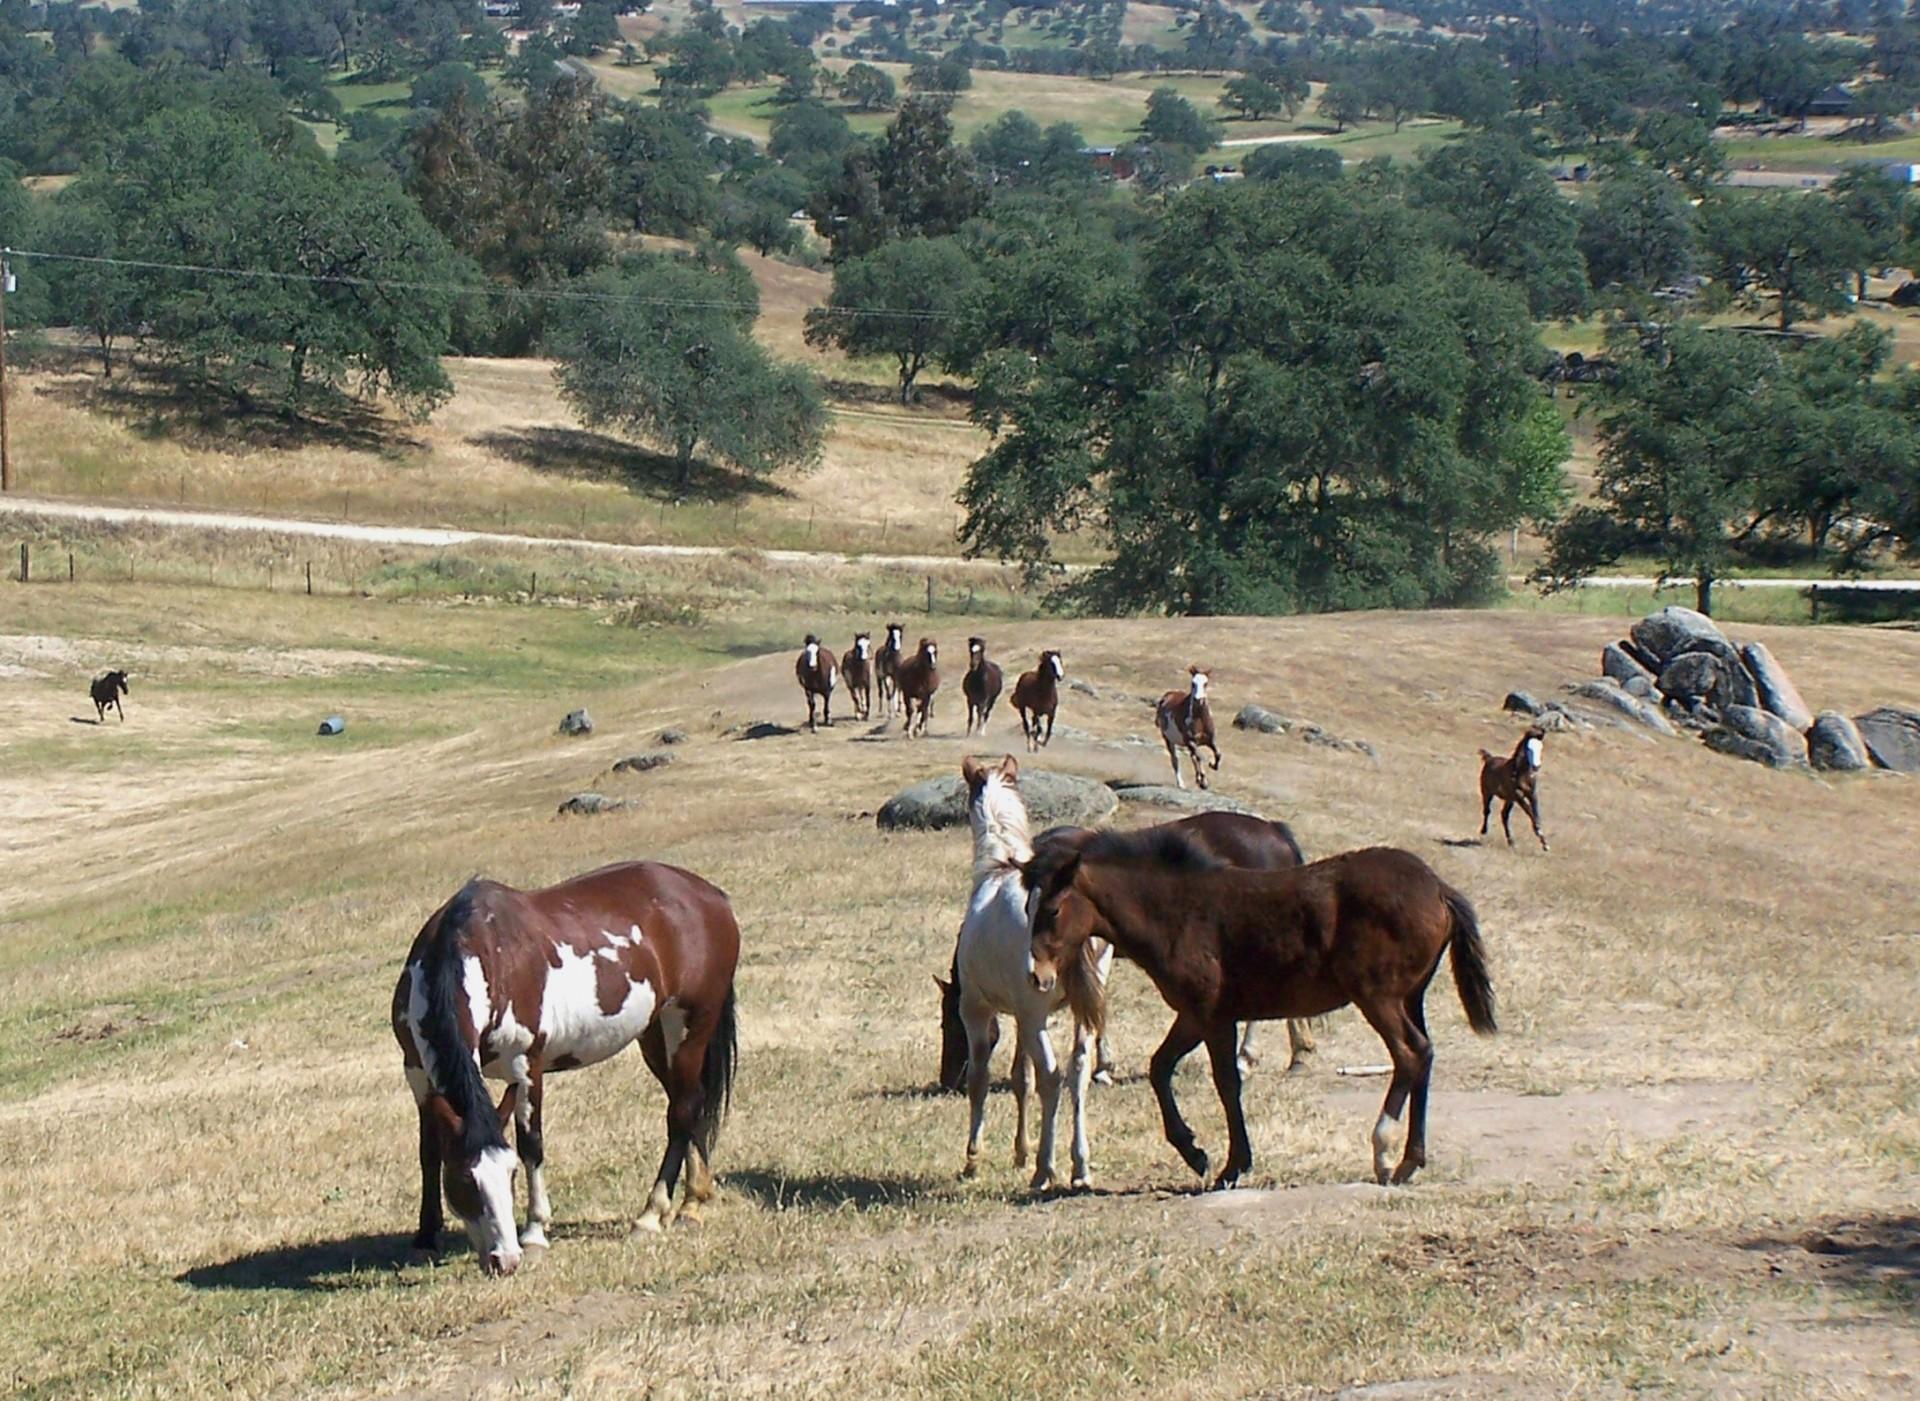 The Spanish Cruce Horse Ranch